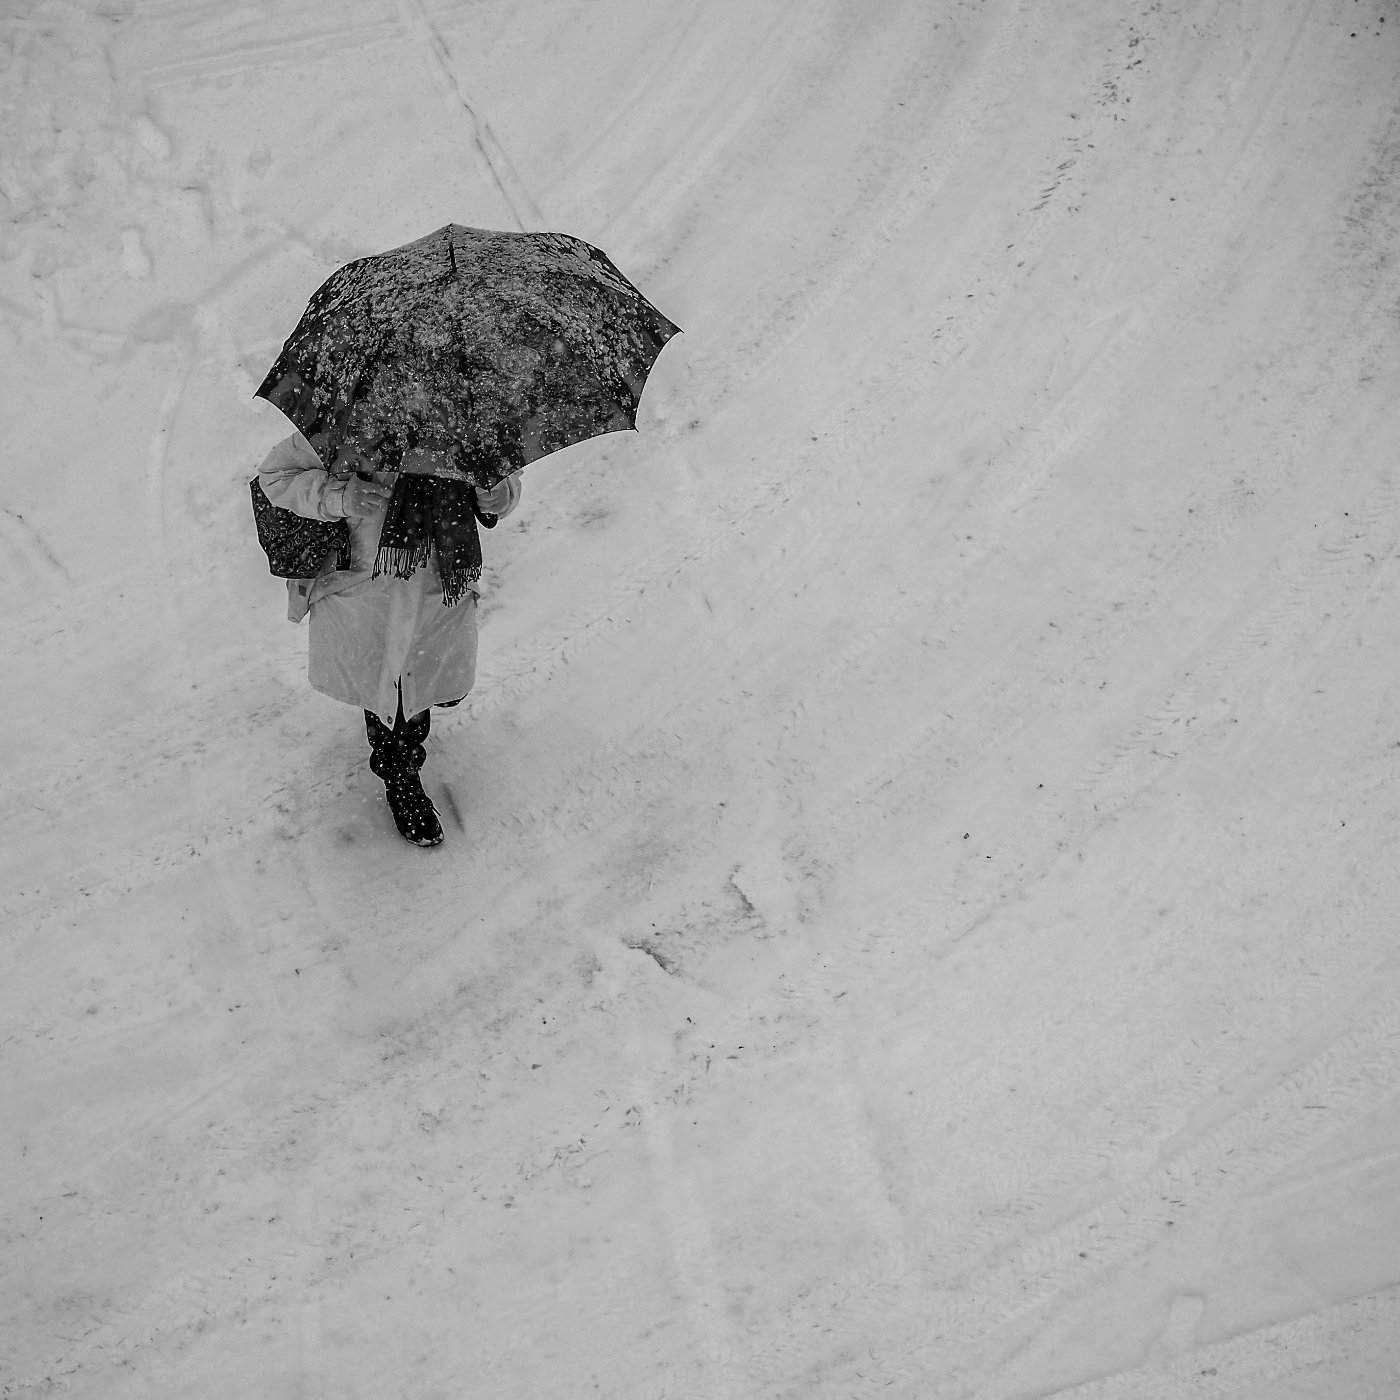 Frau mit  Schirm   | © wolfgang röser | worobo